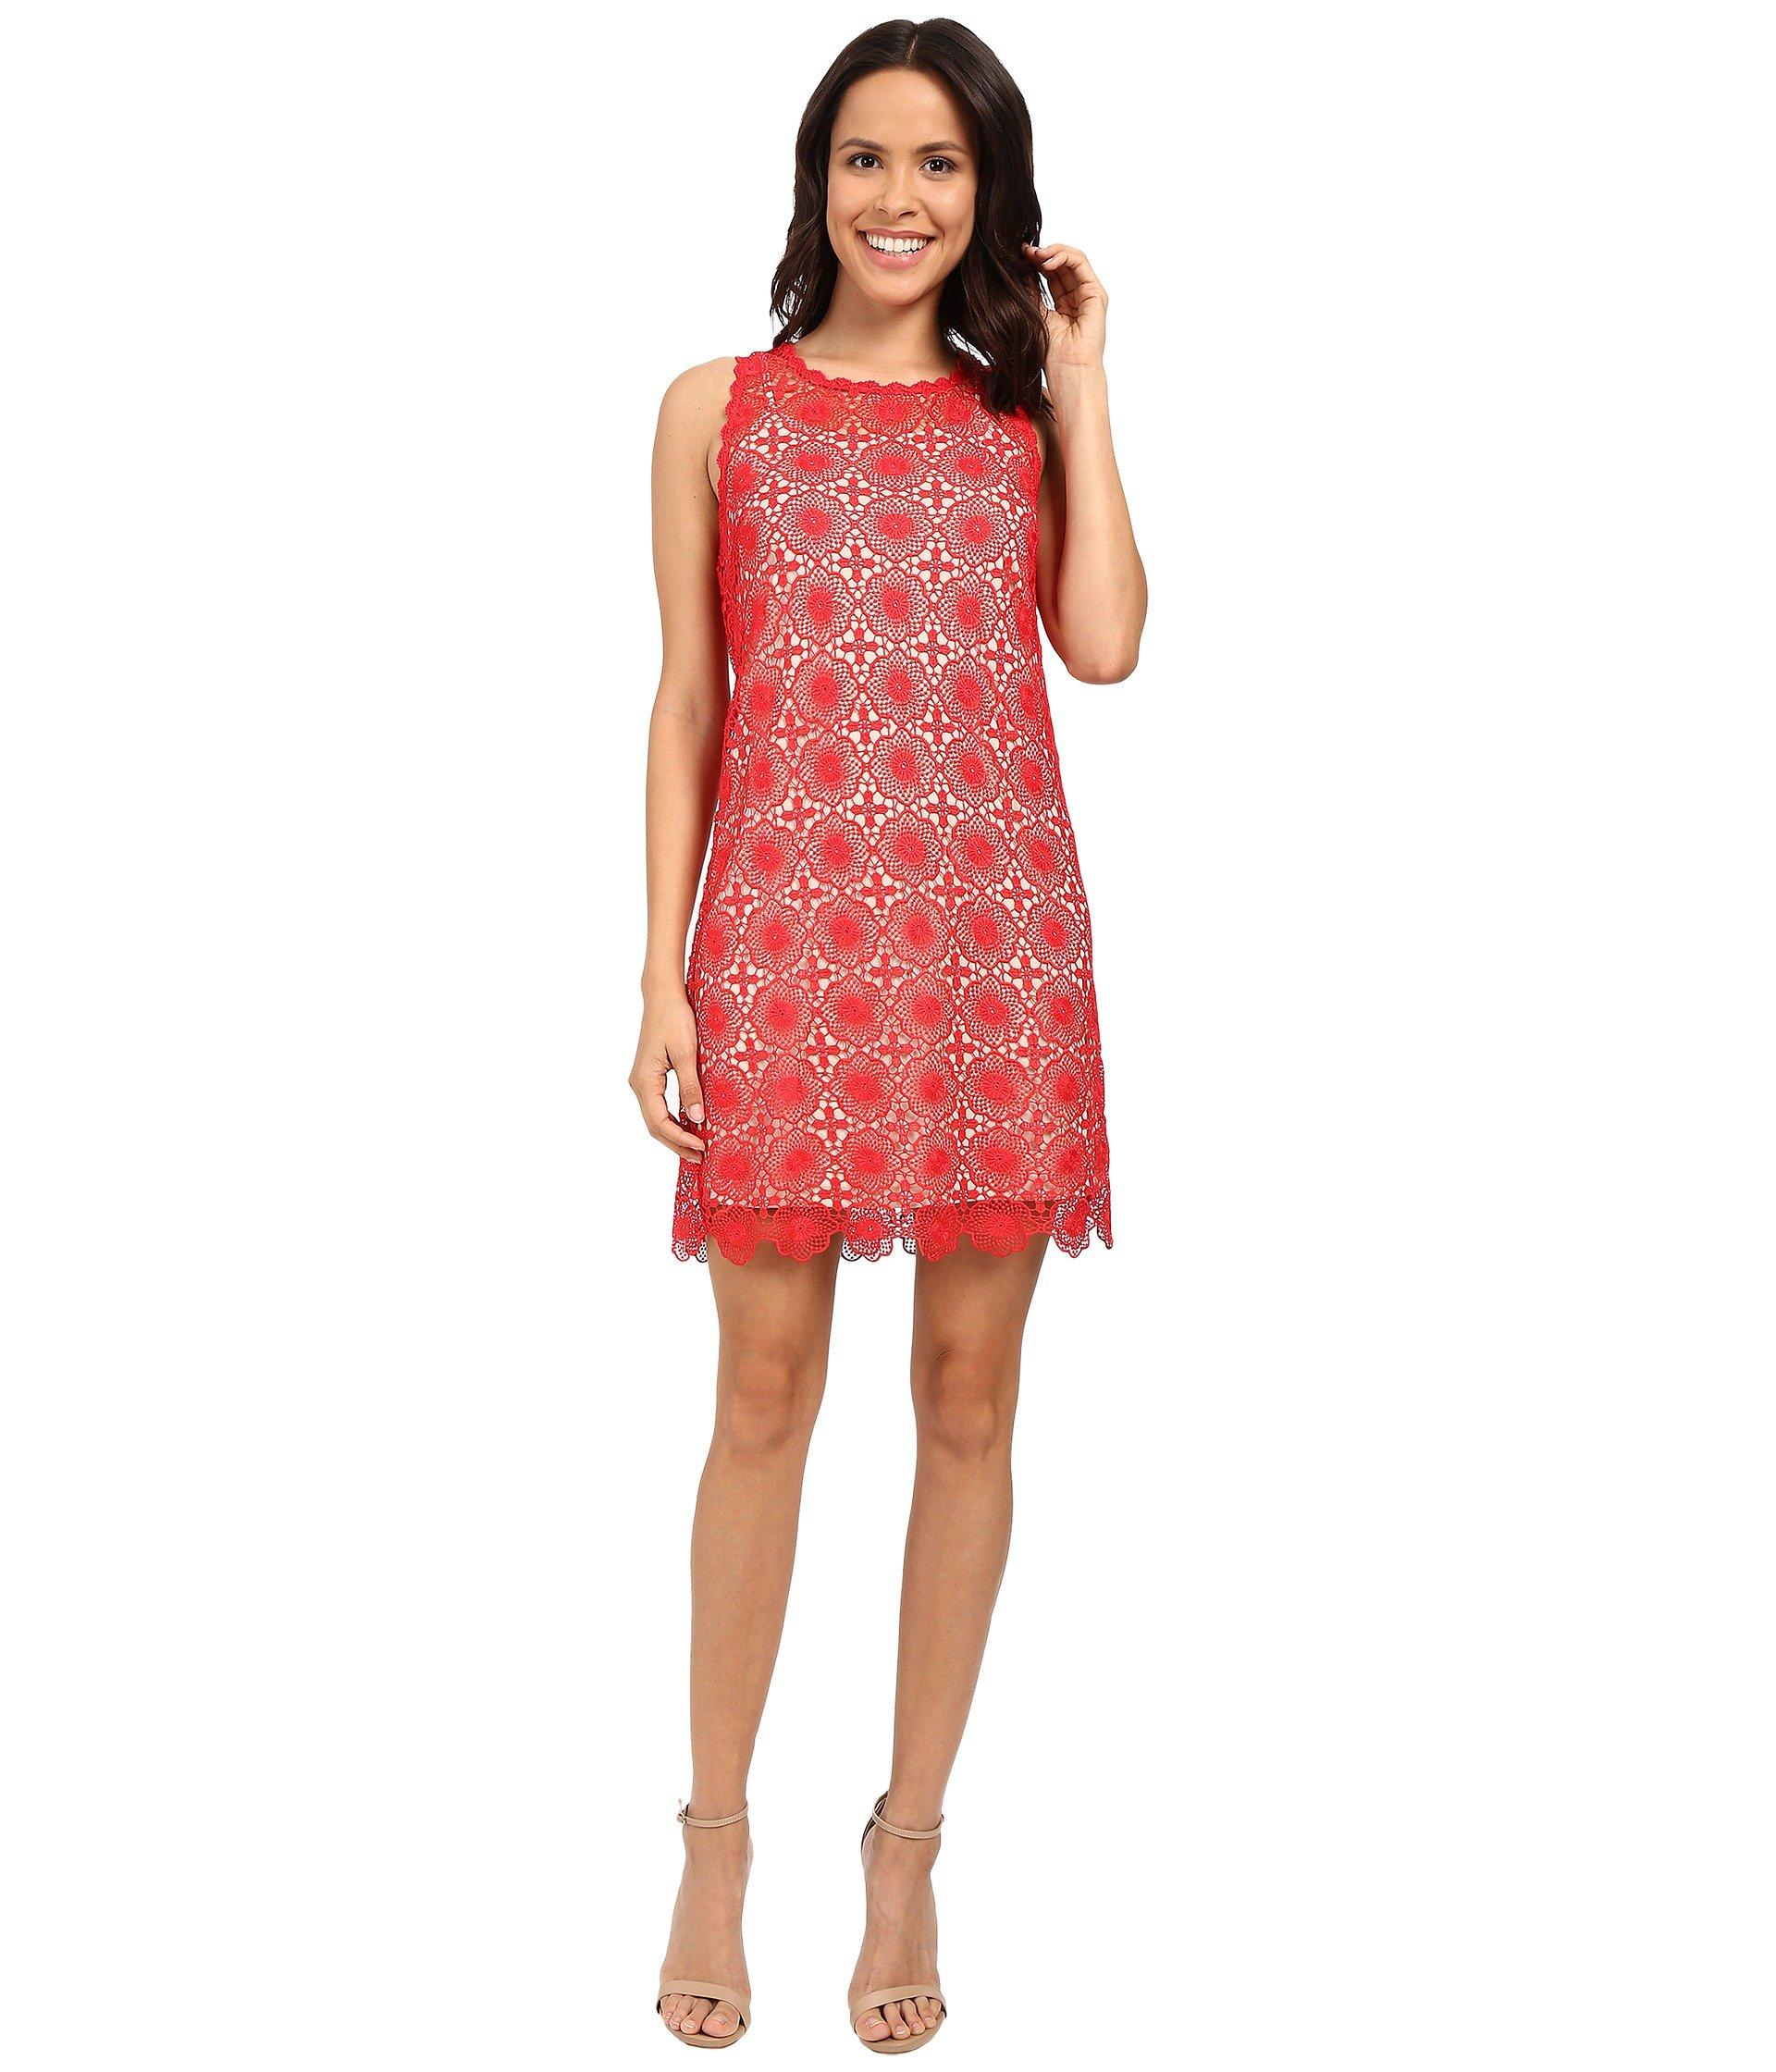 97cde935c3 Kensie Open Floral Lace Dress Ks5K7939 In Candy Apple Combo ...